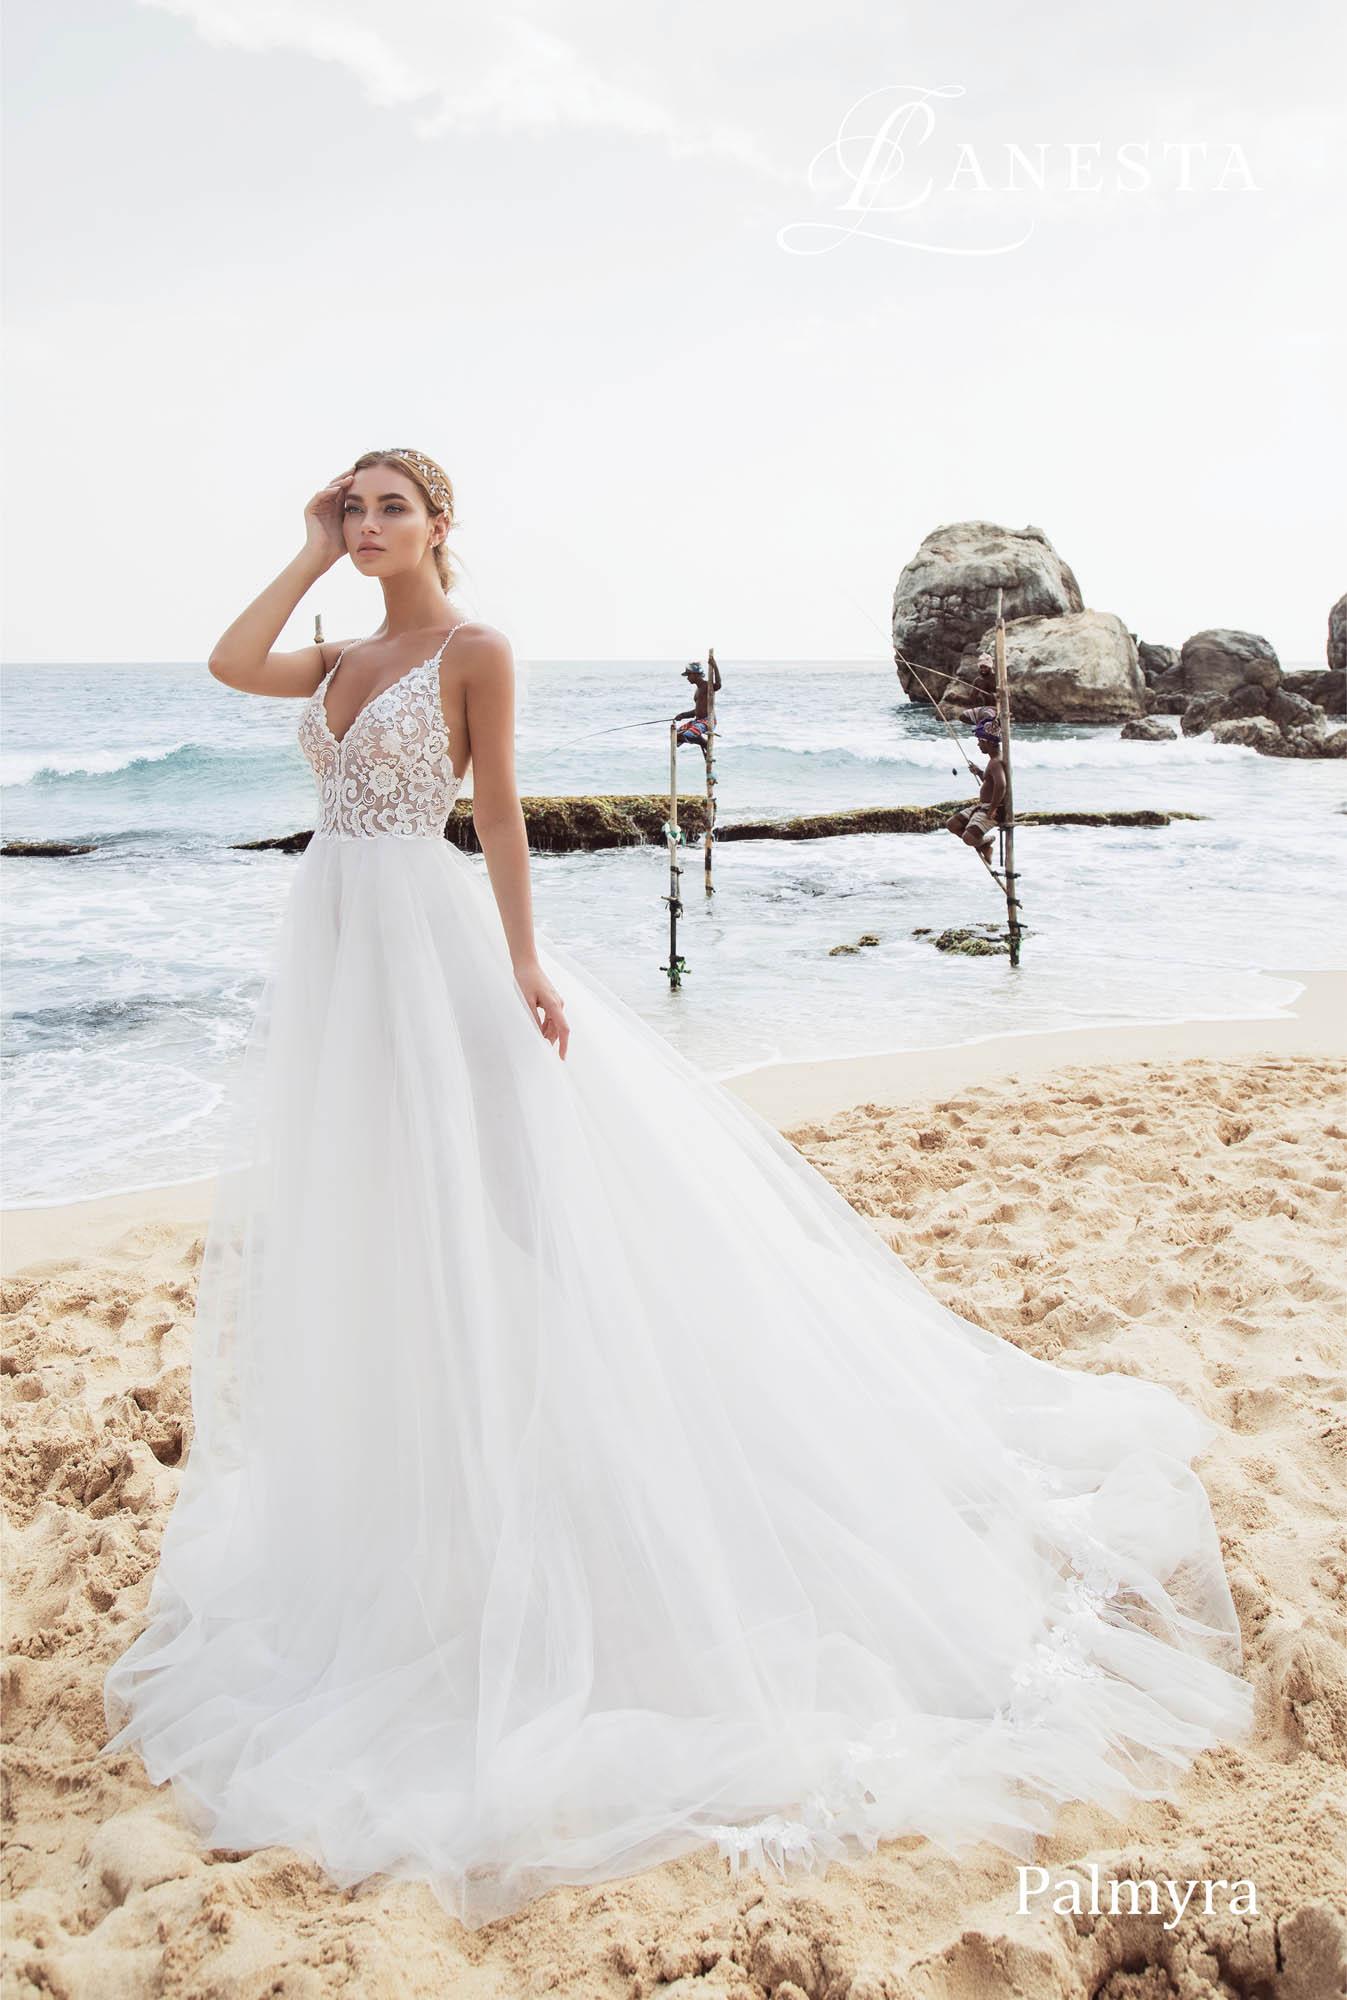 Весiльна сукня Palmyra